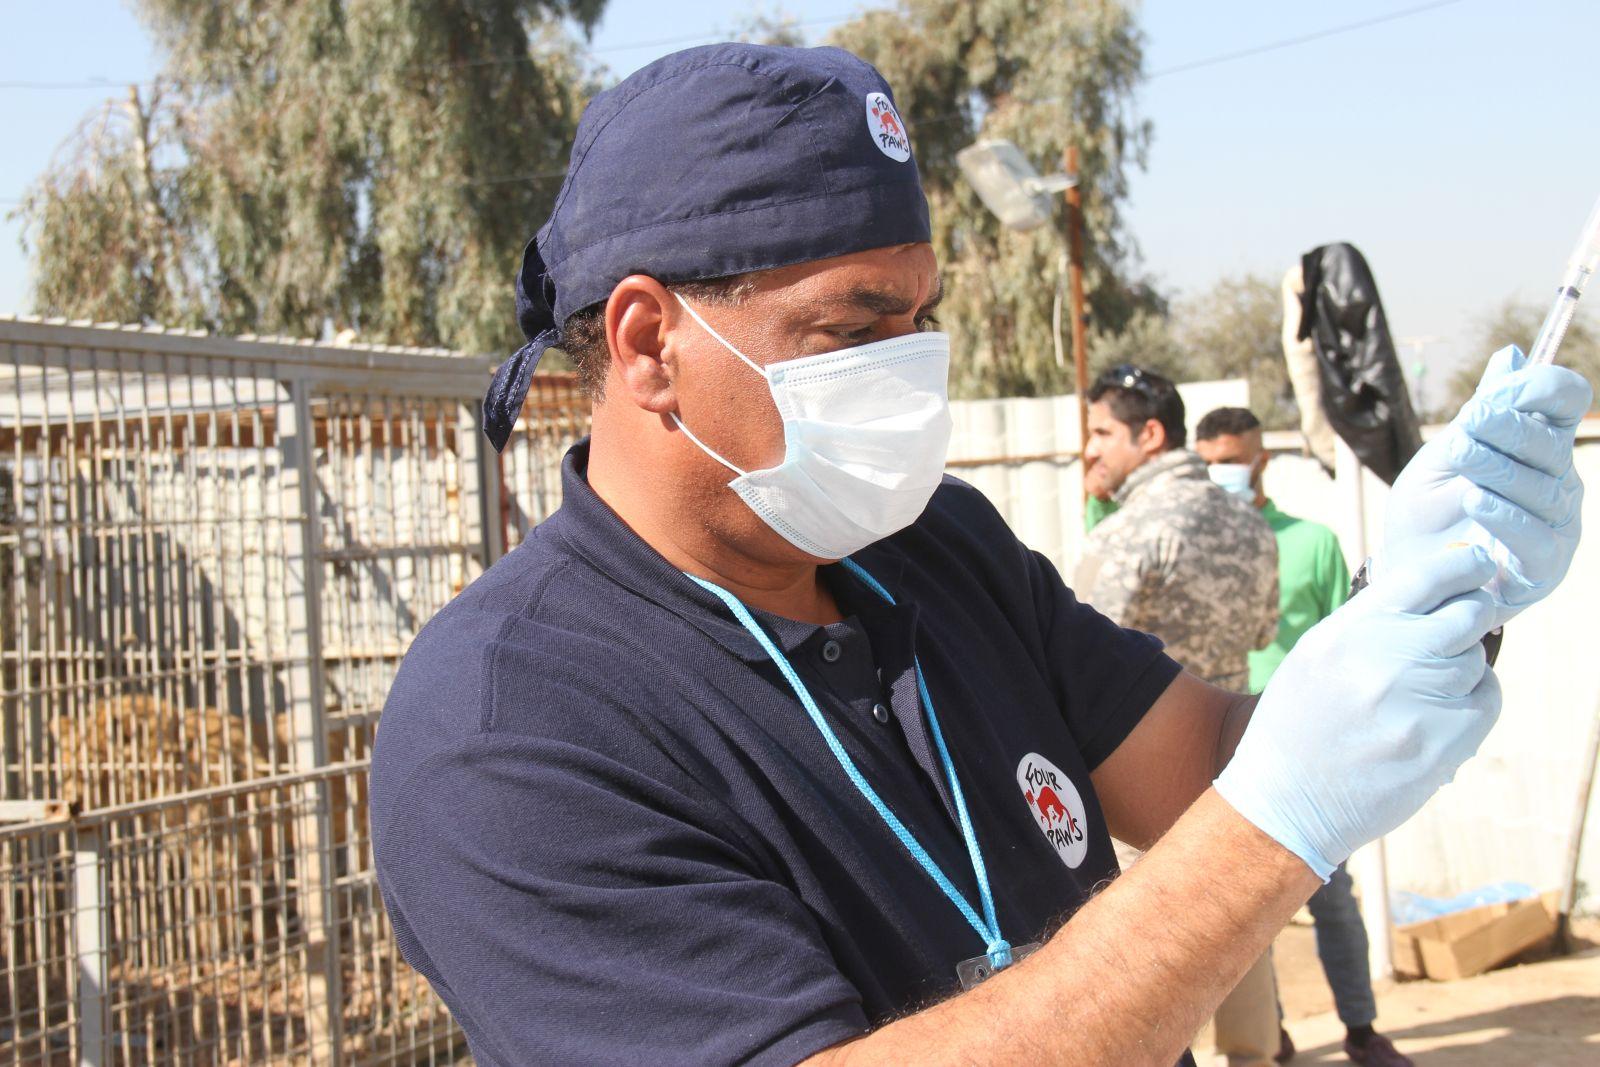 Iraq, Mossul   2017 02 22   Amir visits Mossul Zoo and performs vet checks.